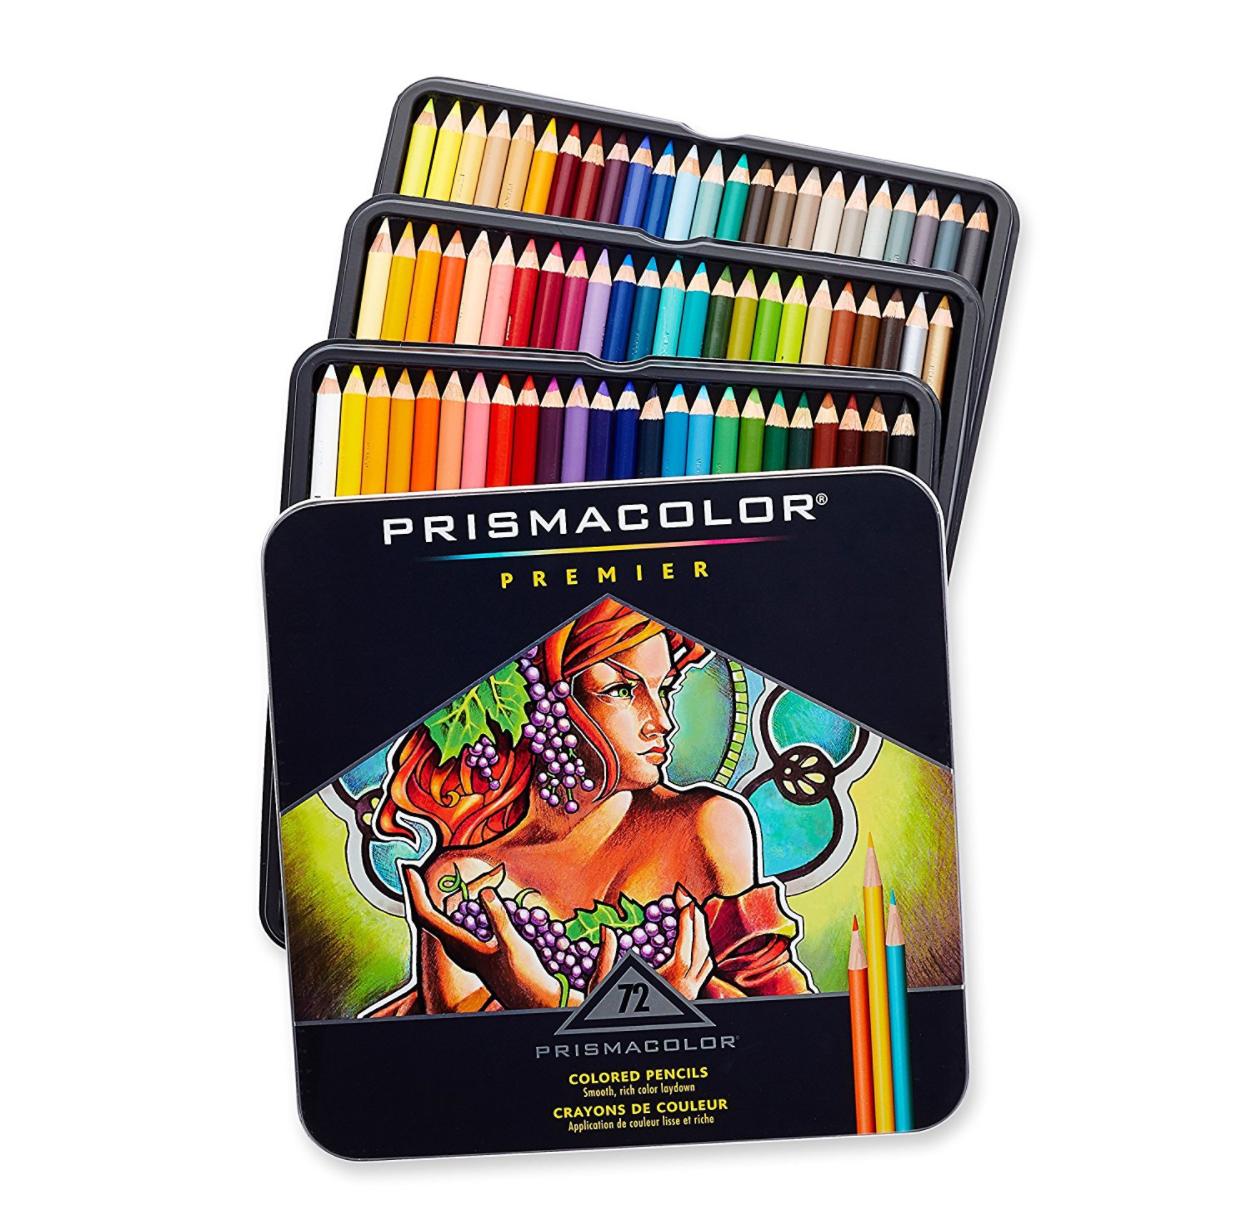 Prismacolor 3599TN Premier Colored Pencils